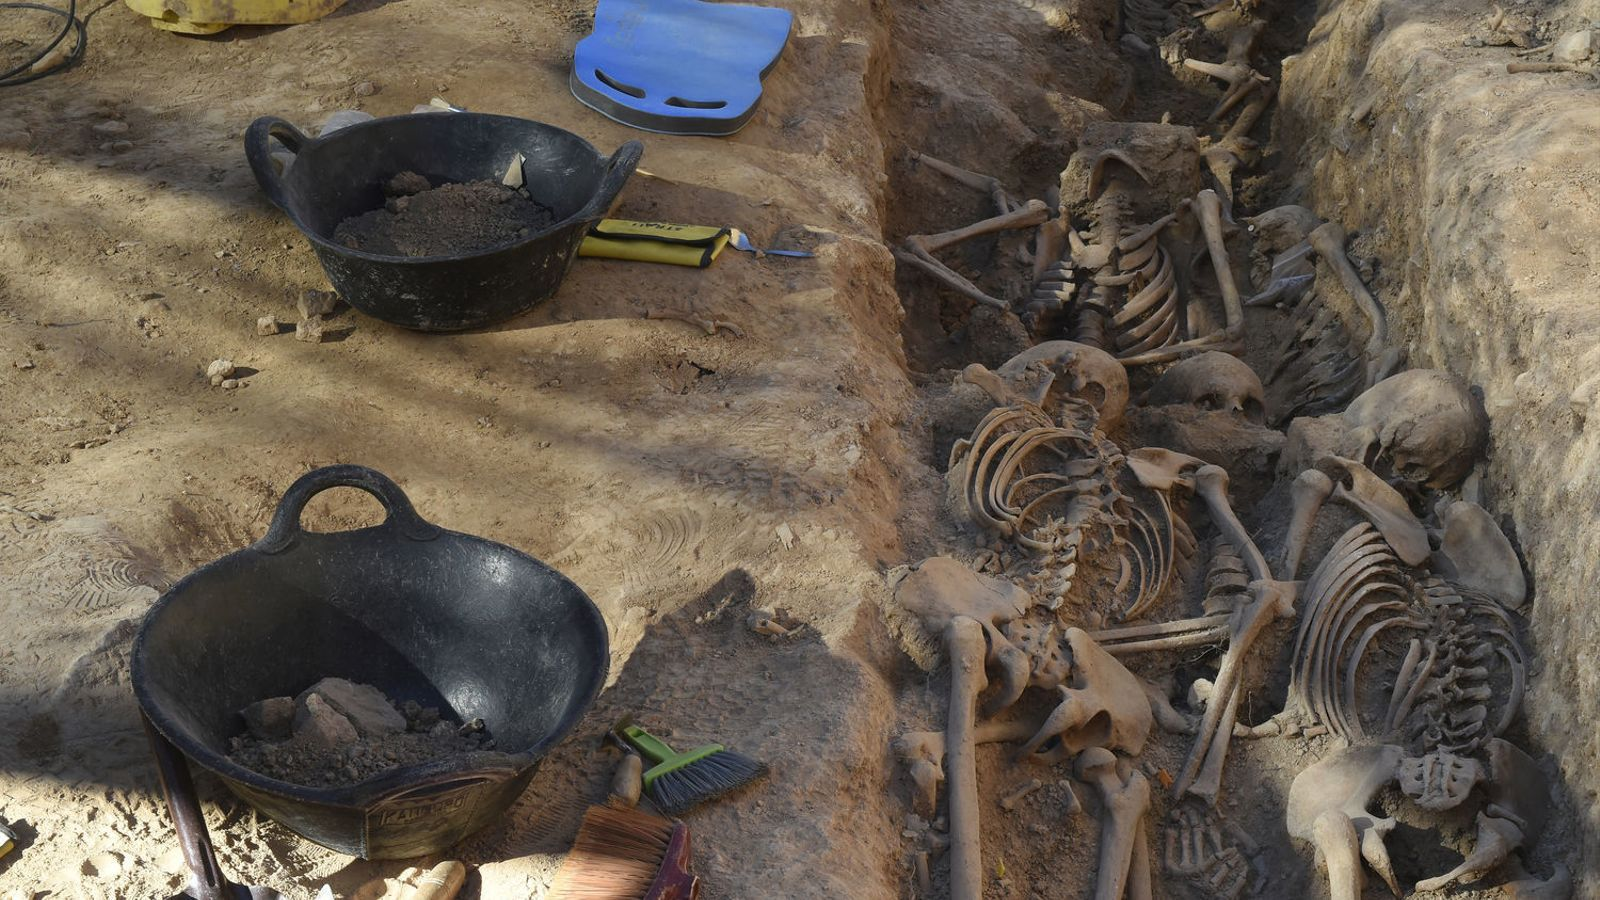 Una de les rases exhumades al vell cementiri d'El Soleràs